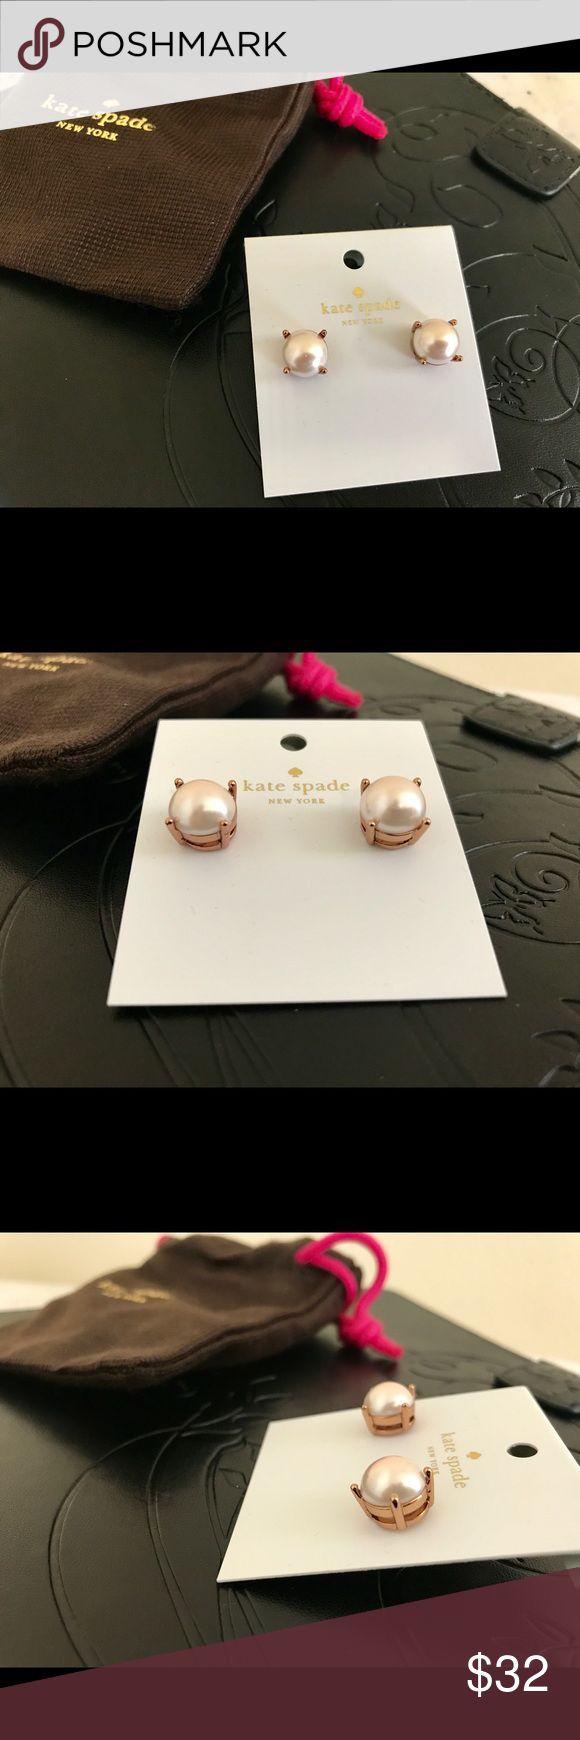 Kate Spade Earrings in blush colour Brand new kate spade Jewelry Earrings